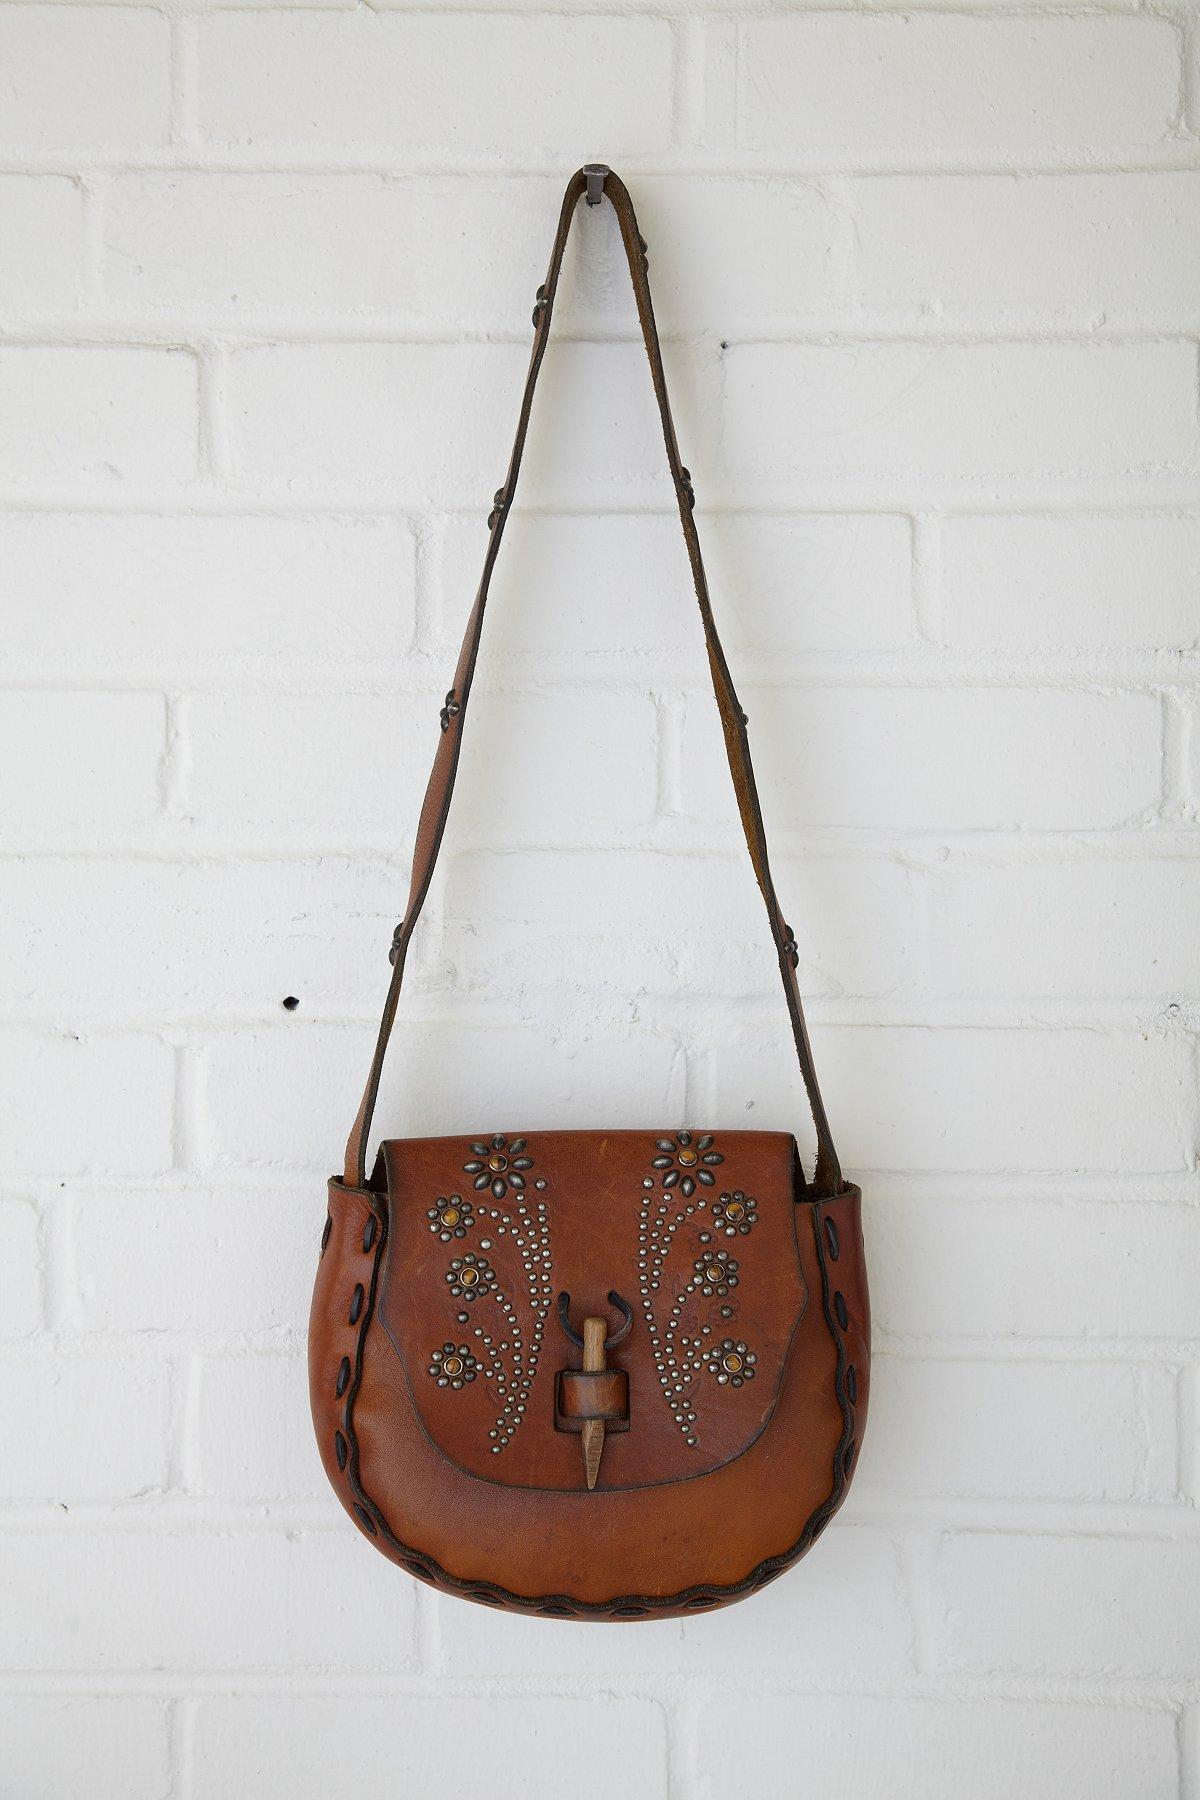 Vintage Tan Flower Stud Saddle Bag